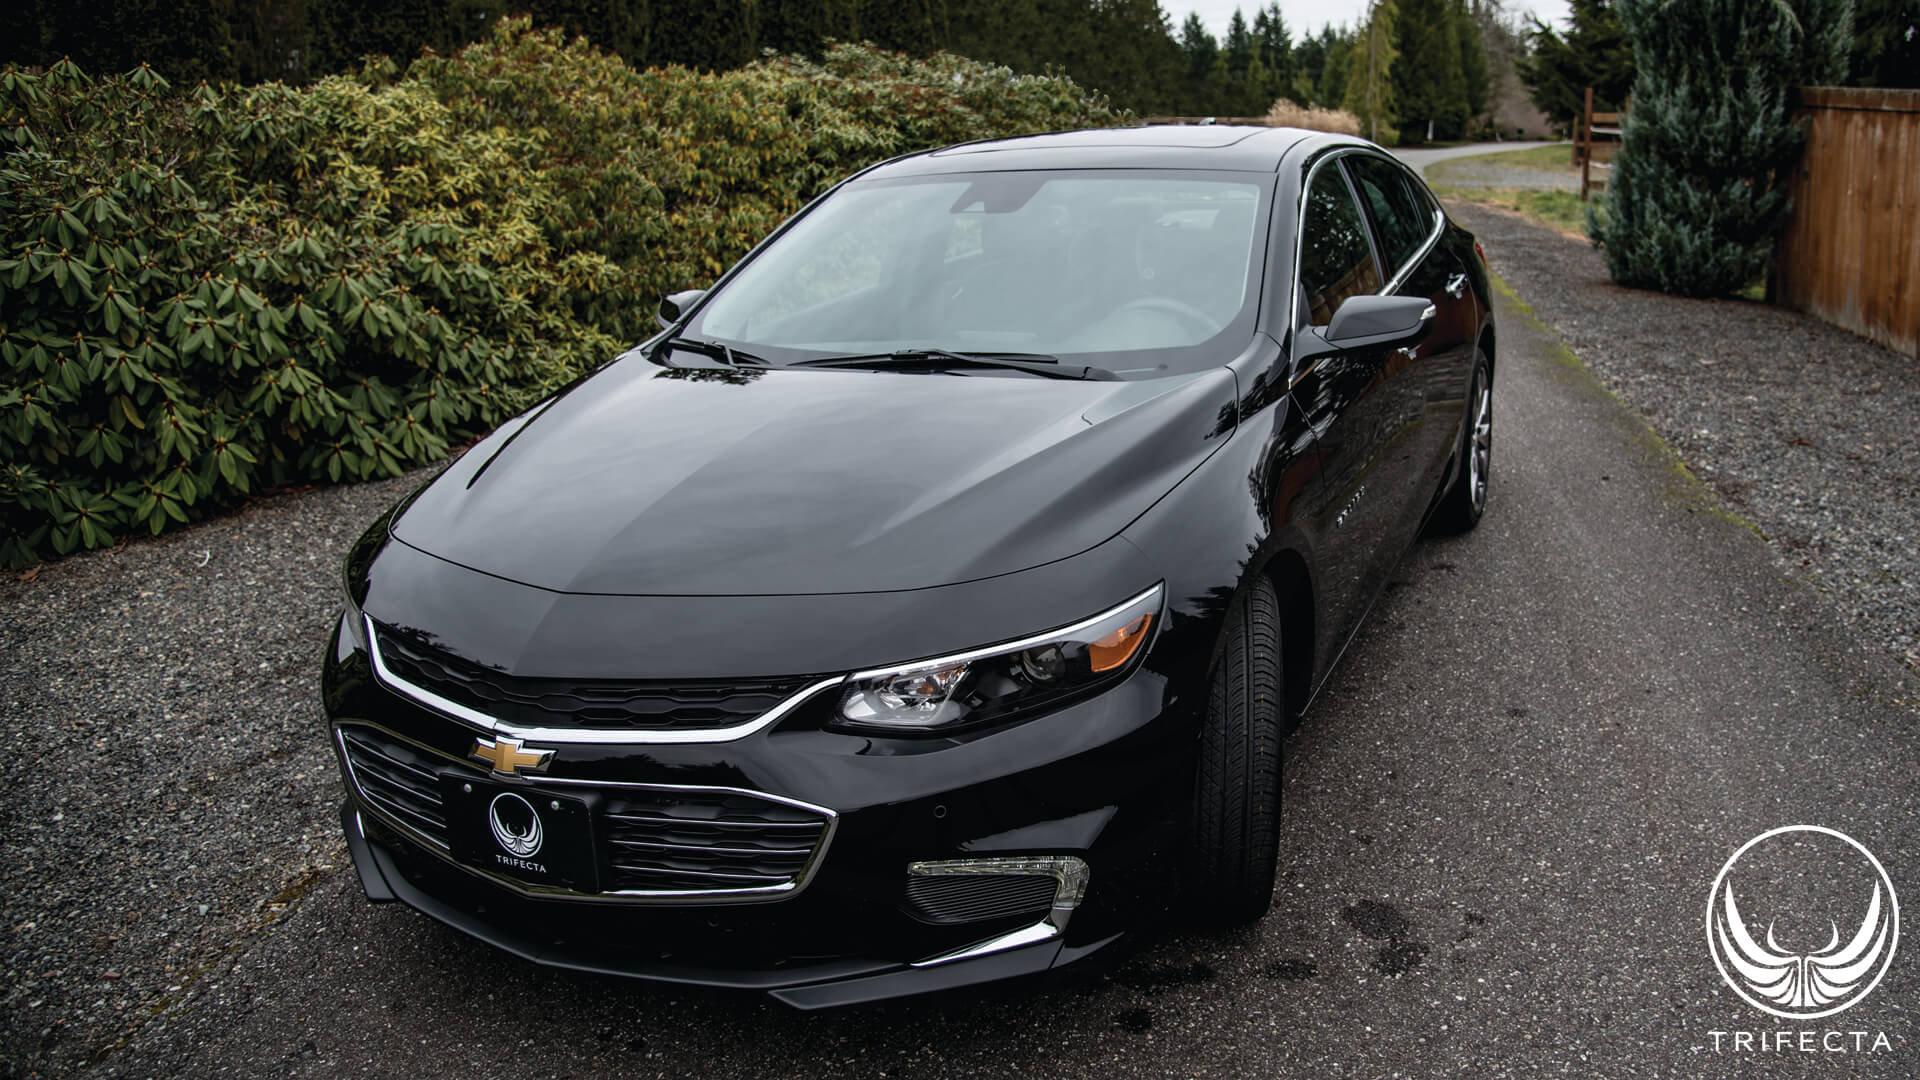 Product Review: 2016--2020 Chevrolet Malibu - 2.0L Turbo - Advantage